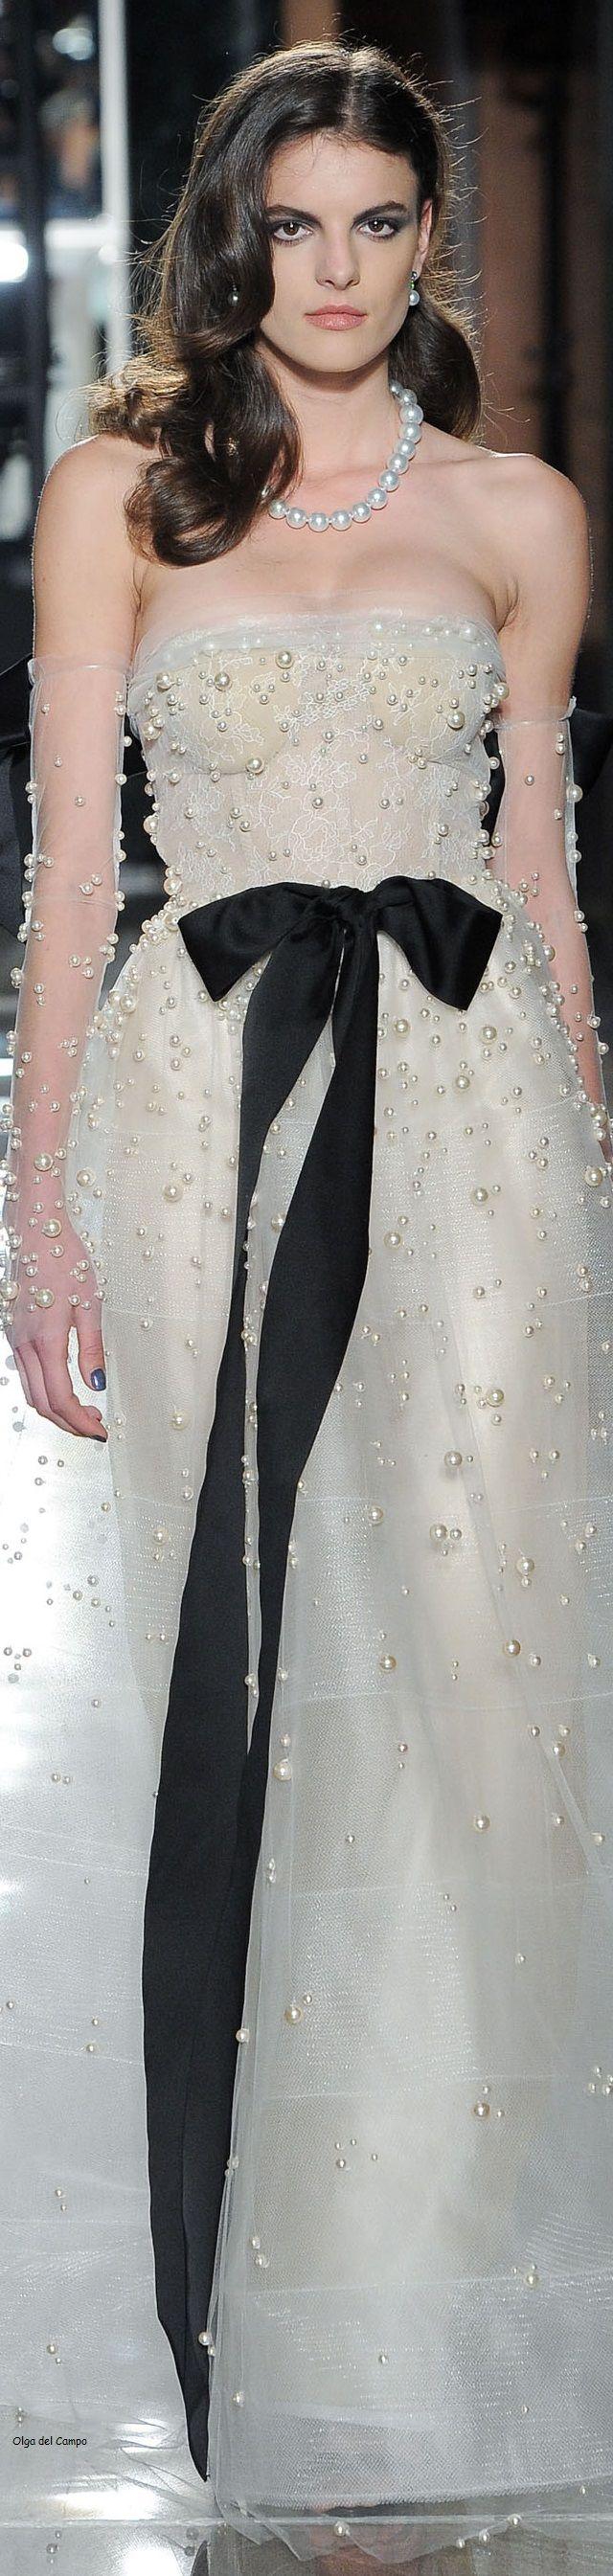 Lace up wedding dress november 2018  best VANILLA CREAM COLORS images on Pinterest